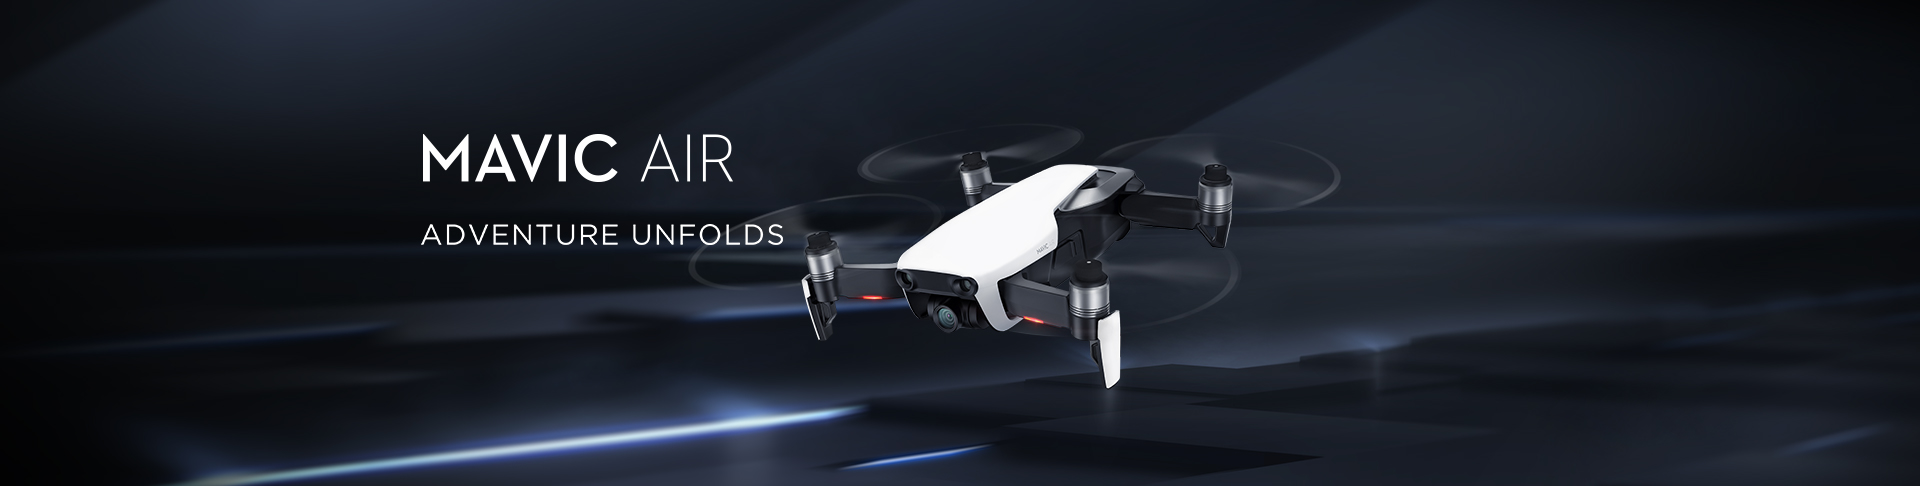 DJI Mavic Air - Your new ultraportable, foldable camera drone.